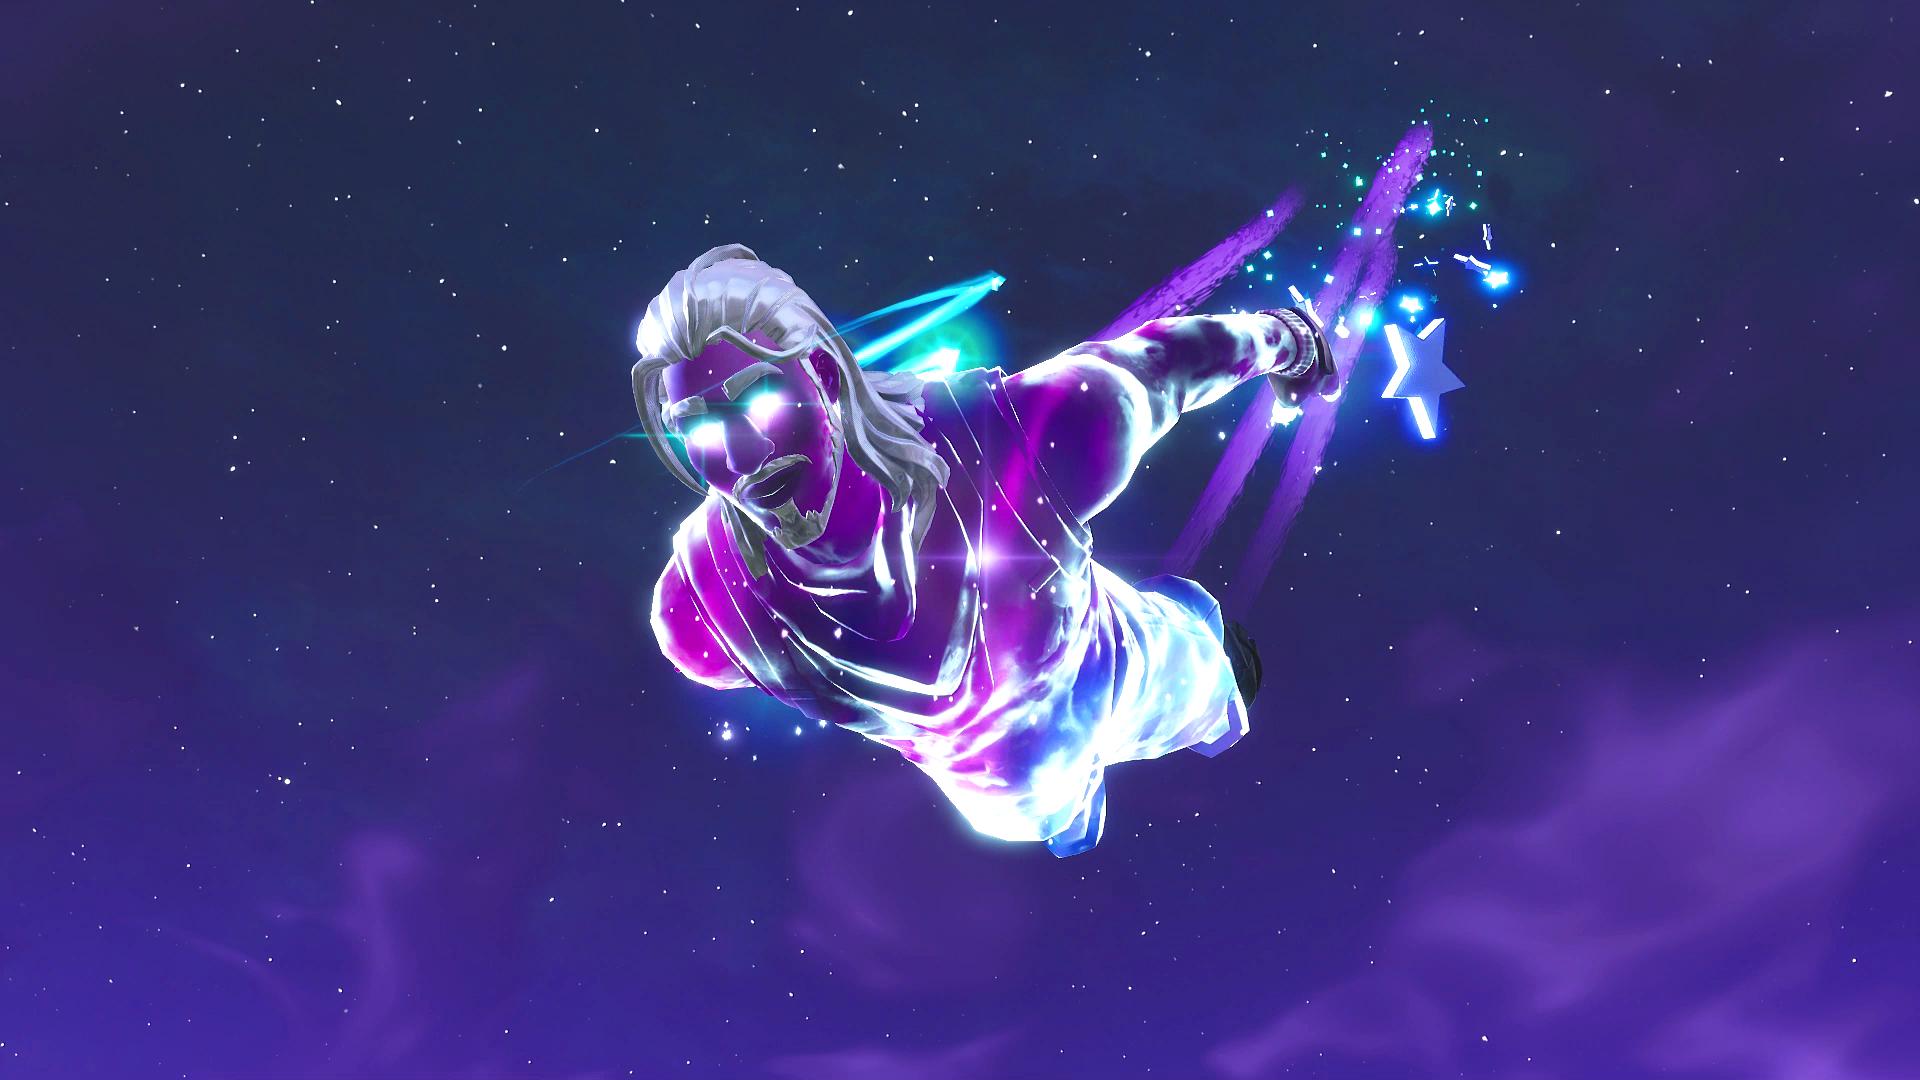 Download Fortnite Characters Png Transparent Ikonik Png Gif Base Jour Ferie Battle Royale